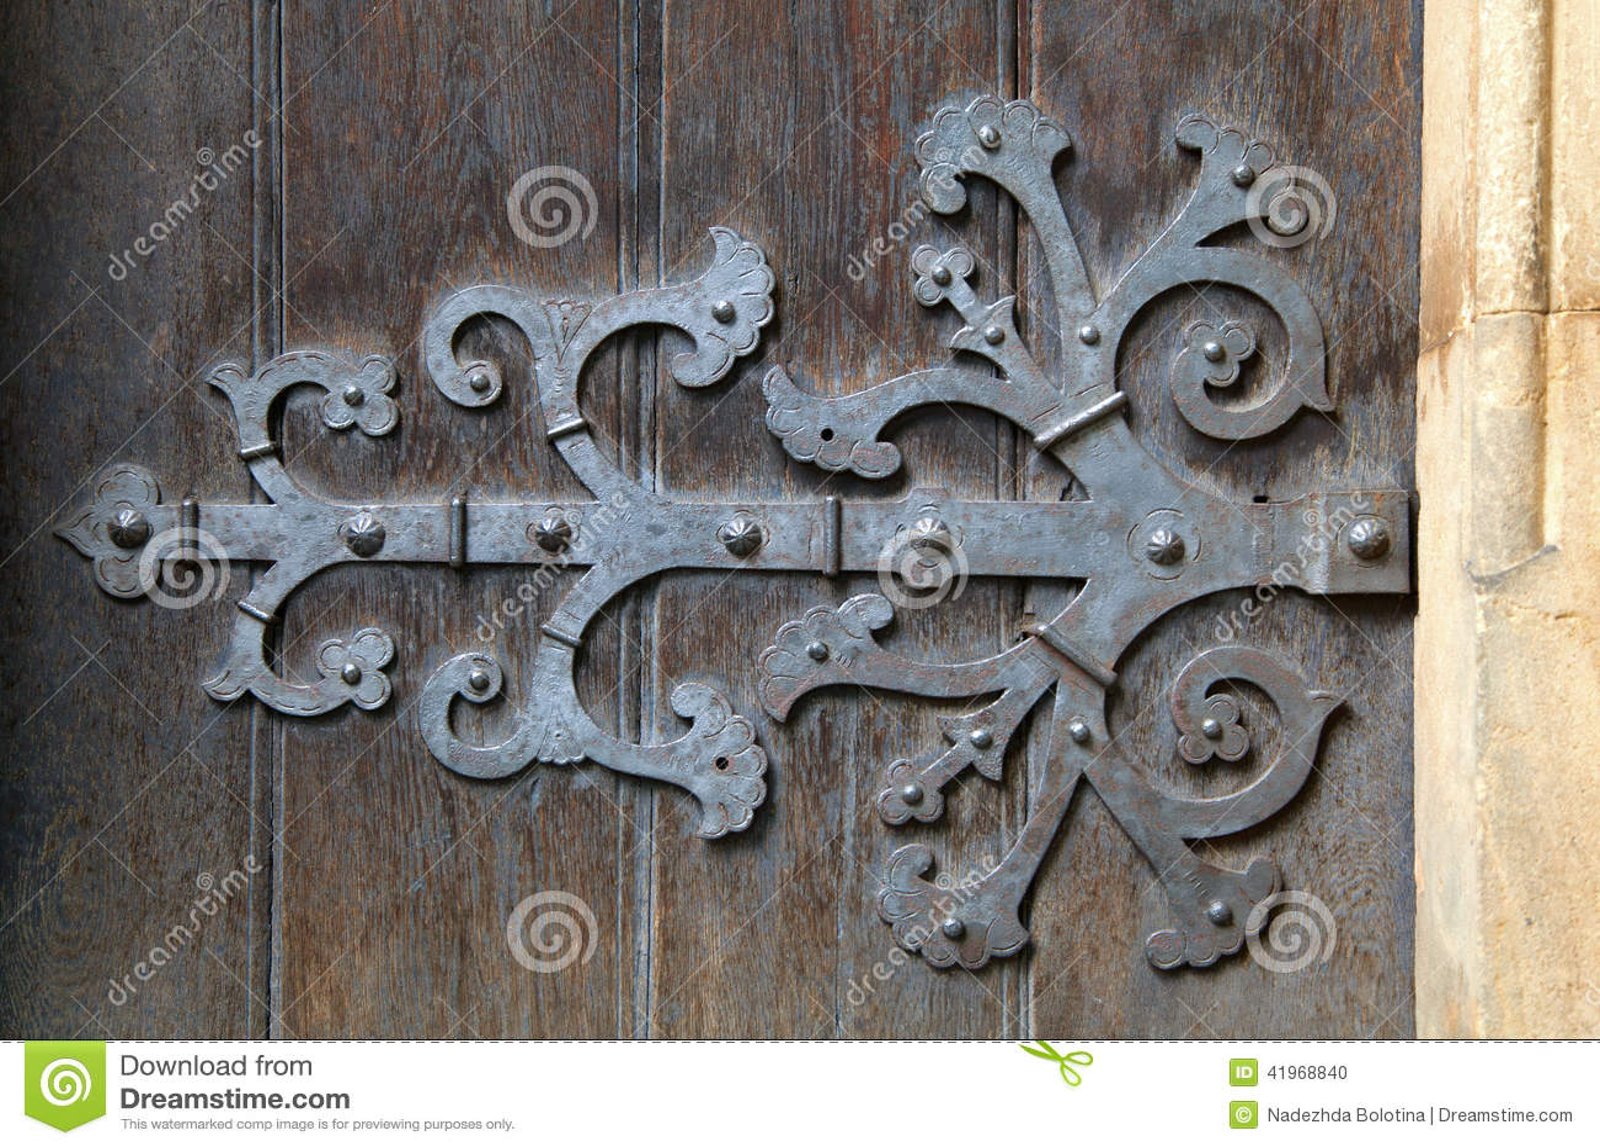 Decorative Door Hinge Stock Photo - Image: 41968840